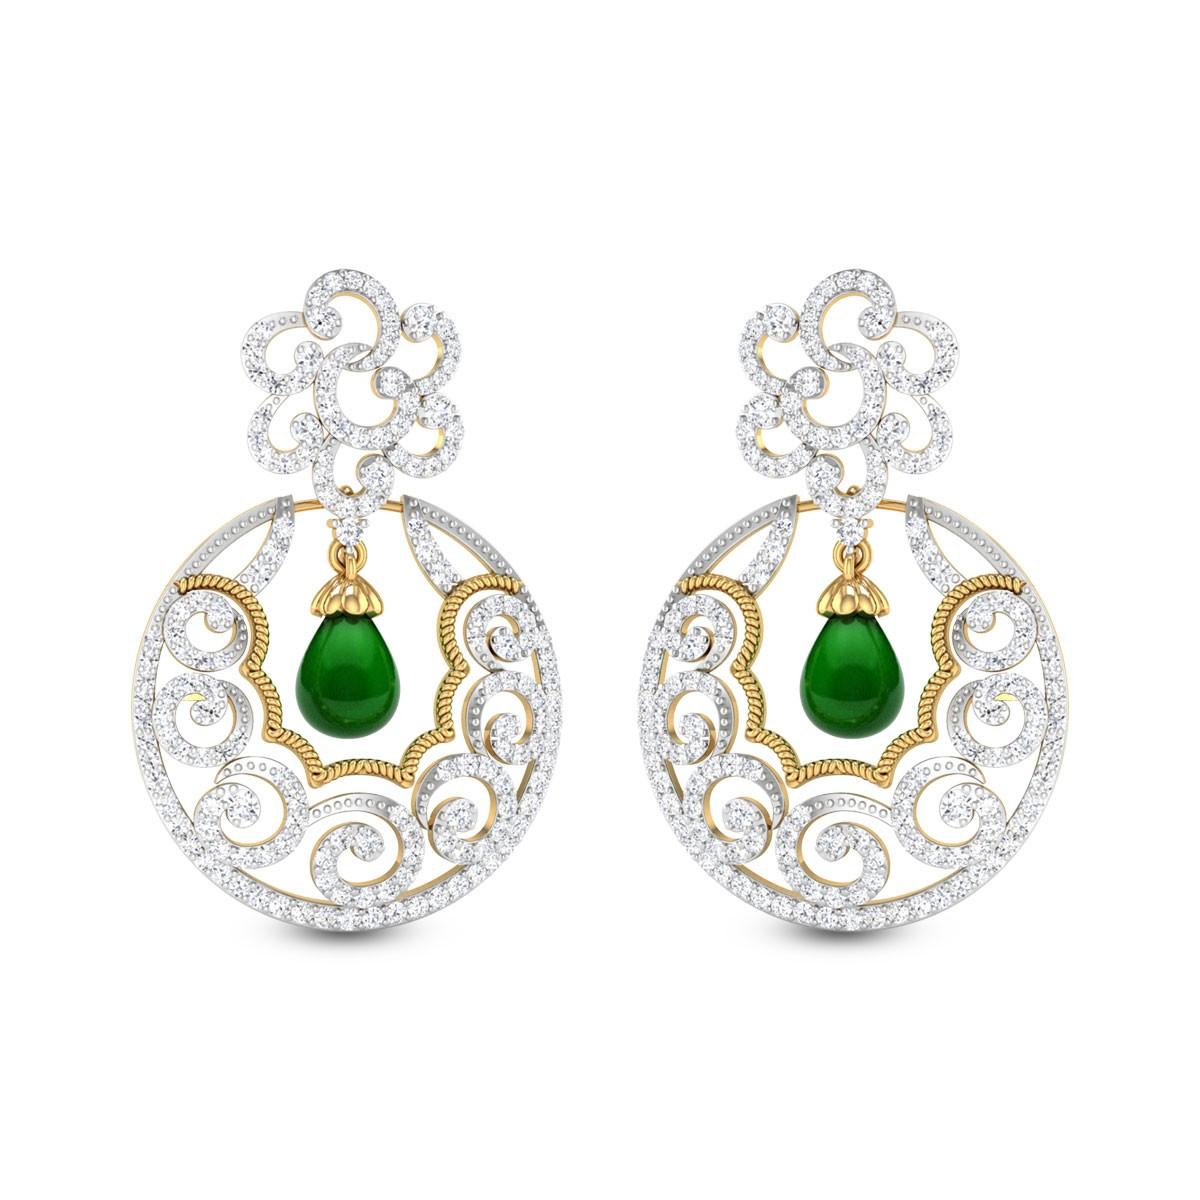 Eulophia Diamond Earrings